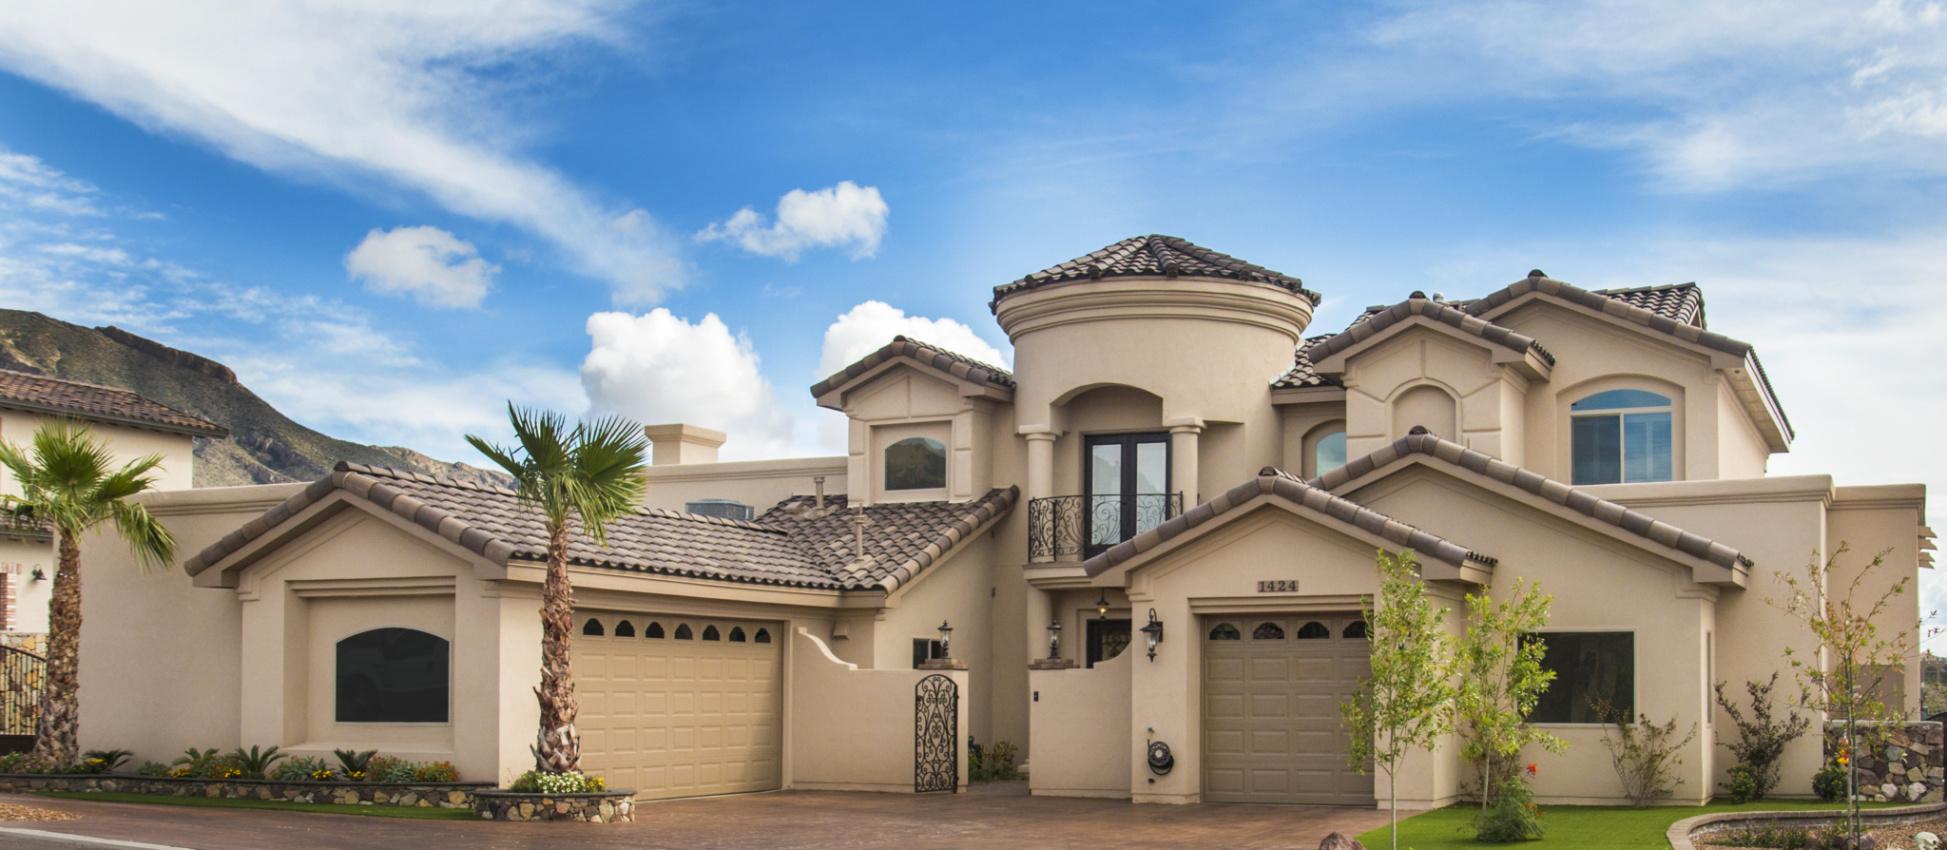 Home Builders: